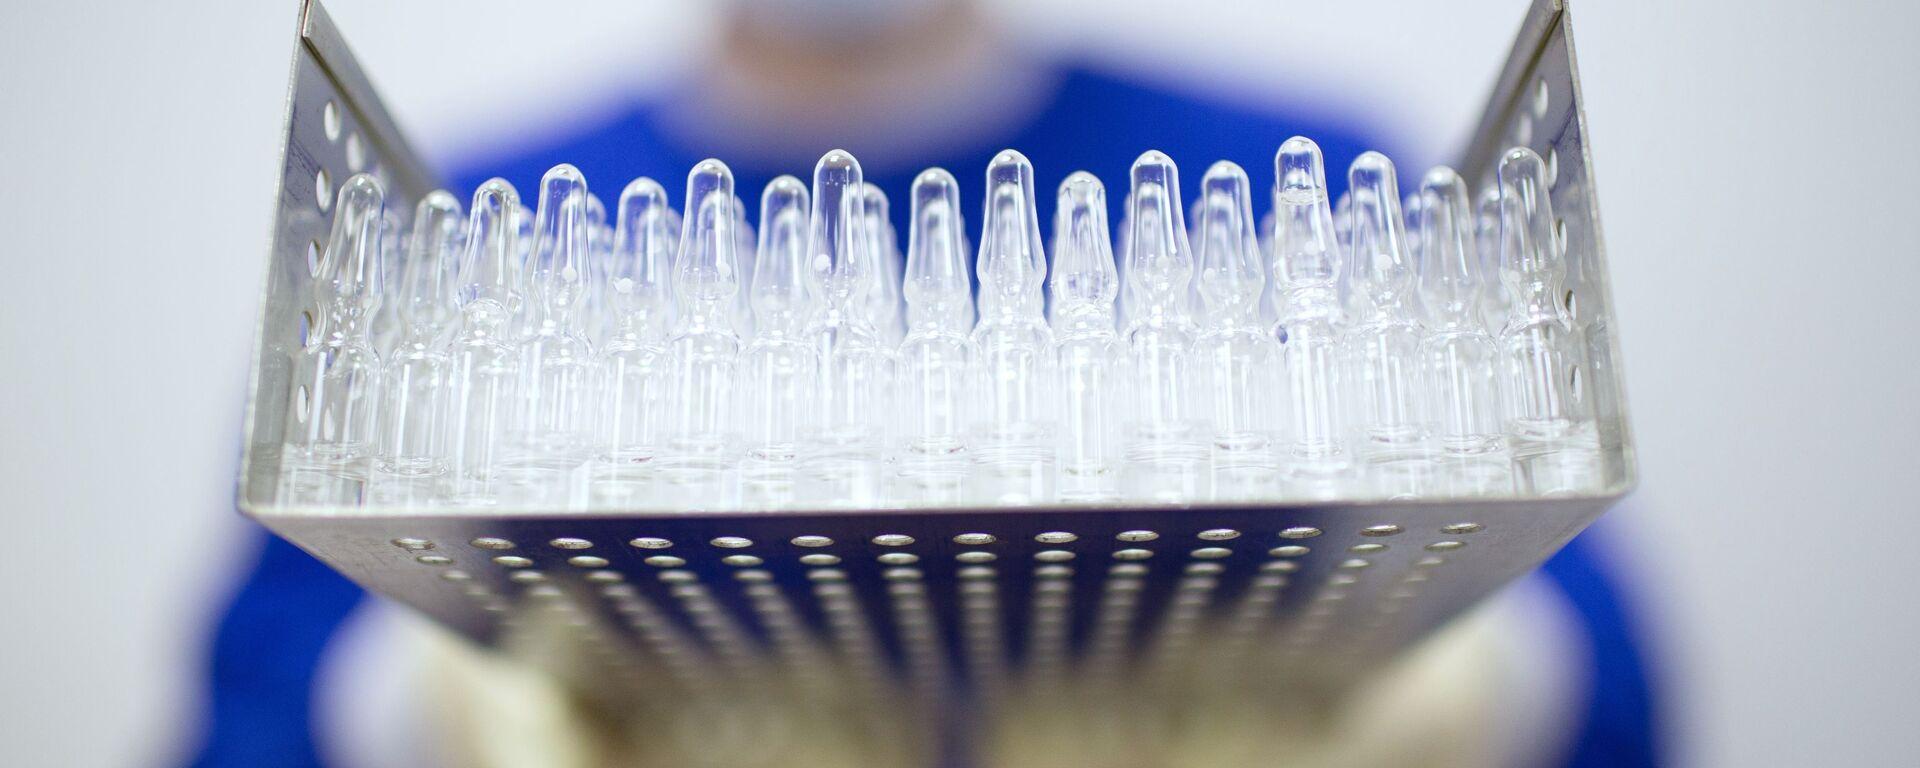 Производство вакцины от COVID-19 на фармацевтическом заводе Биннофарм - Sputnik Таджикистан, 1920, 05.07.2021